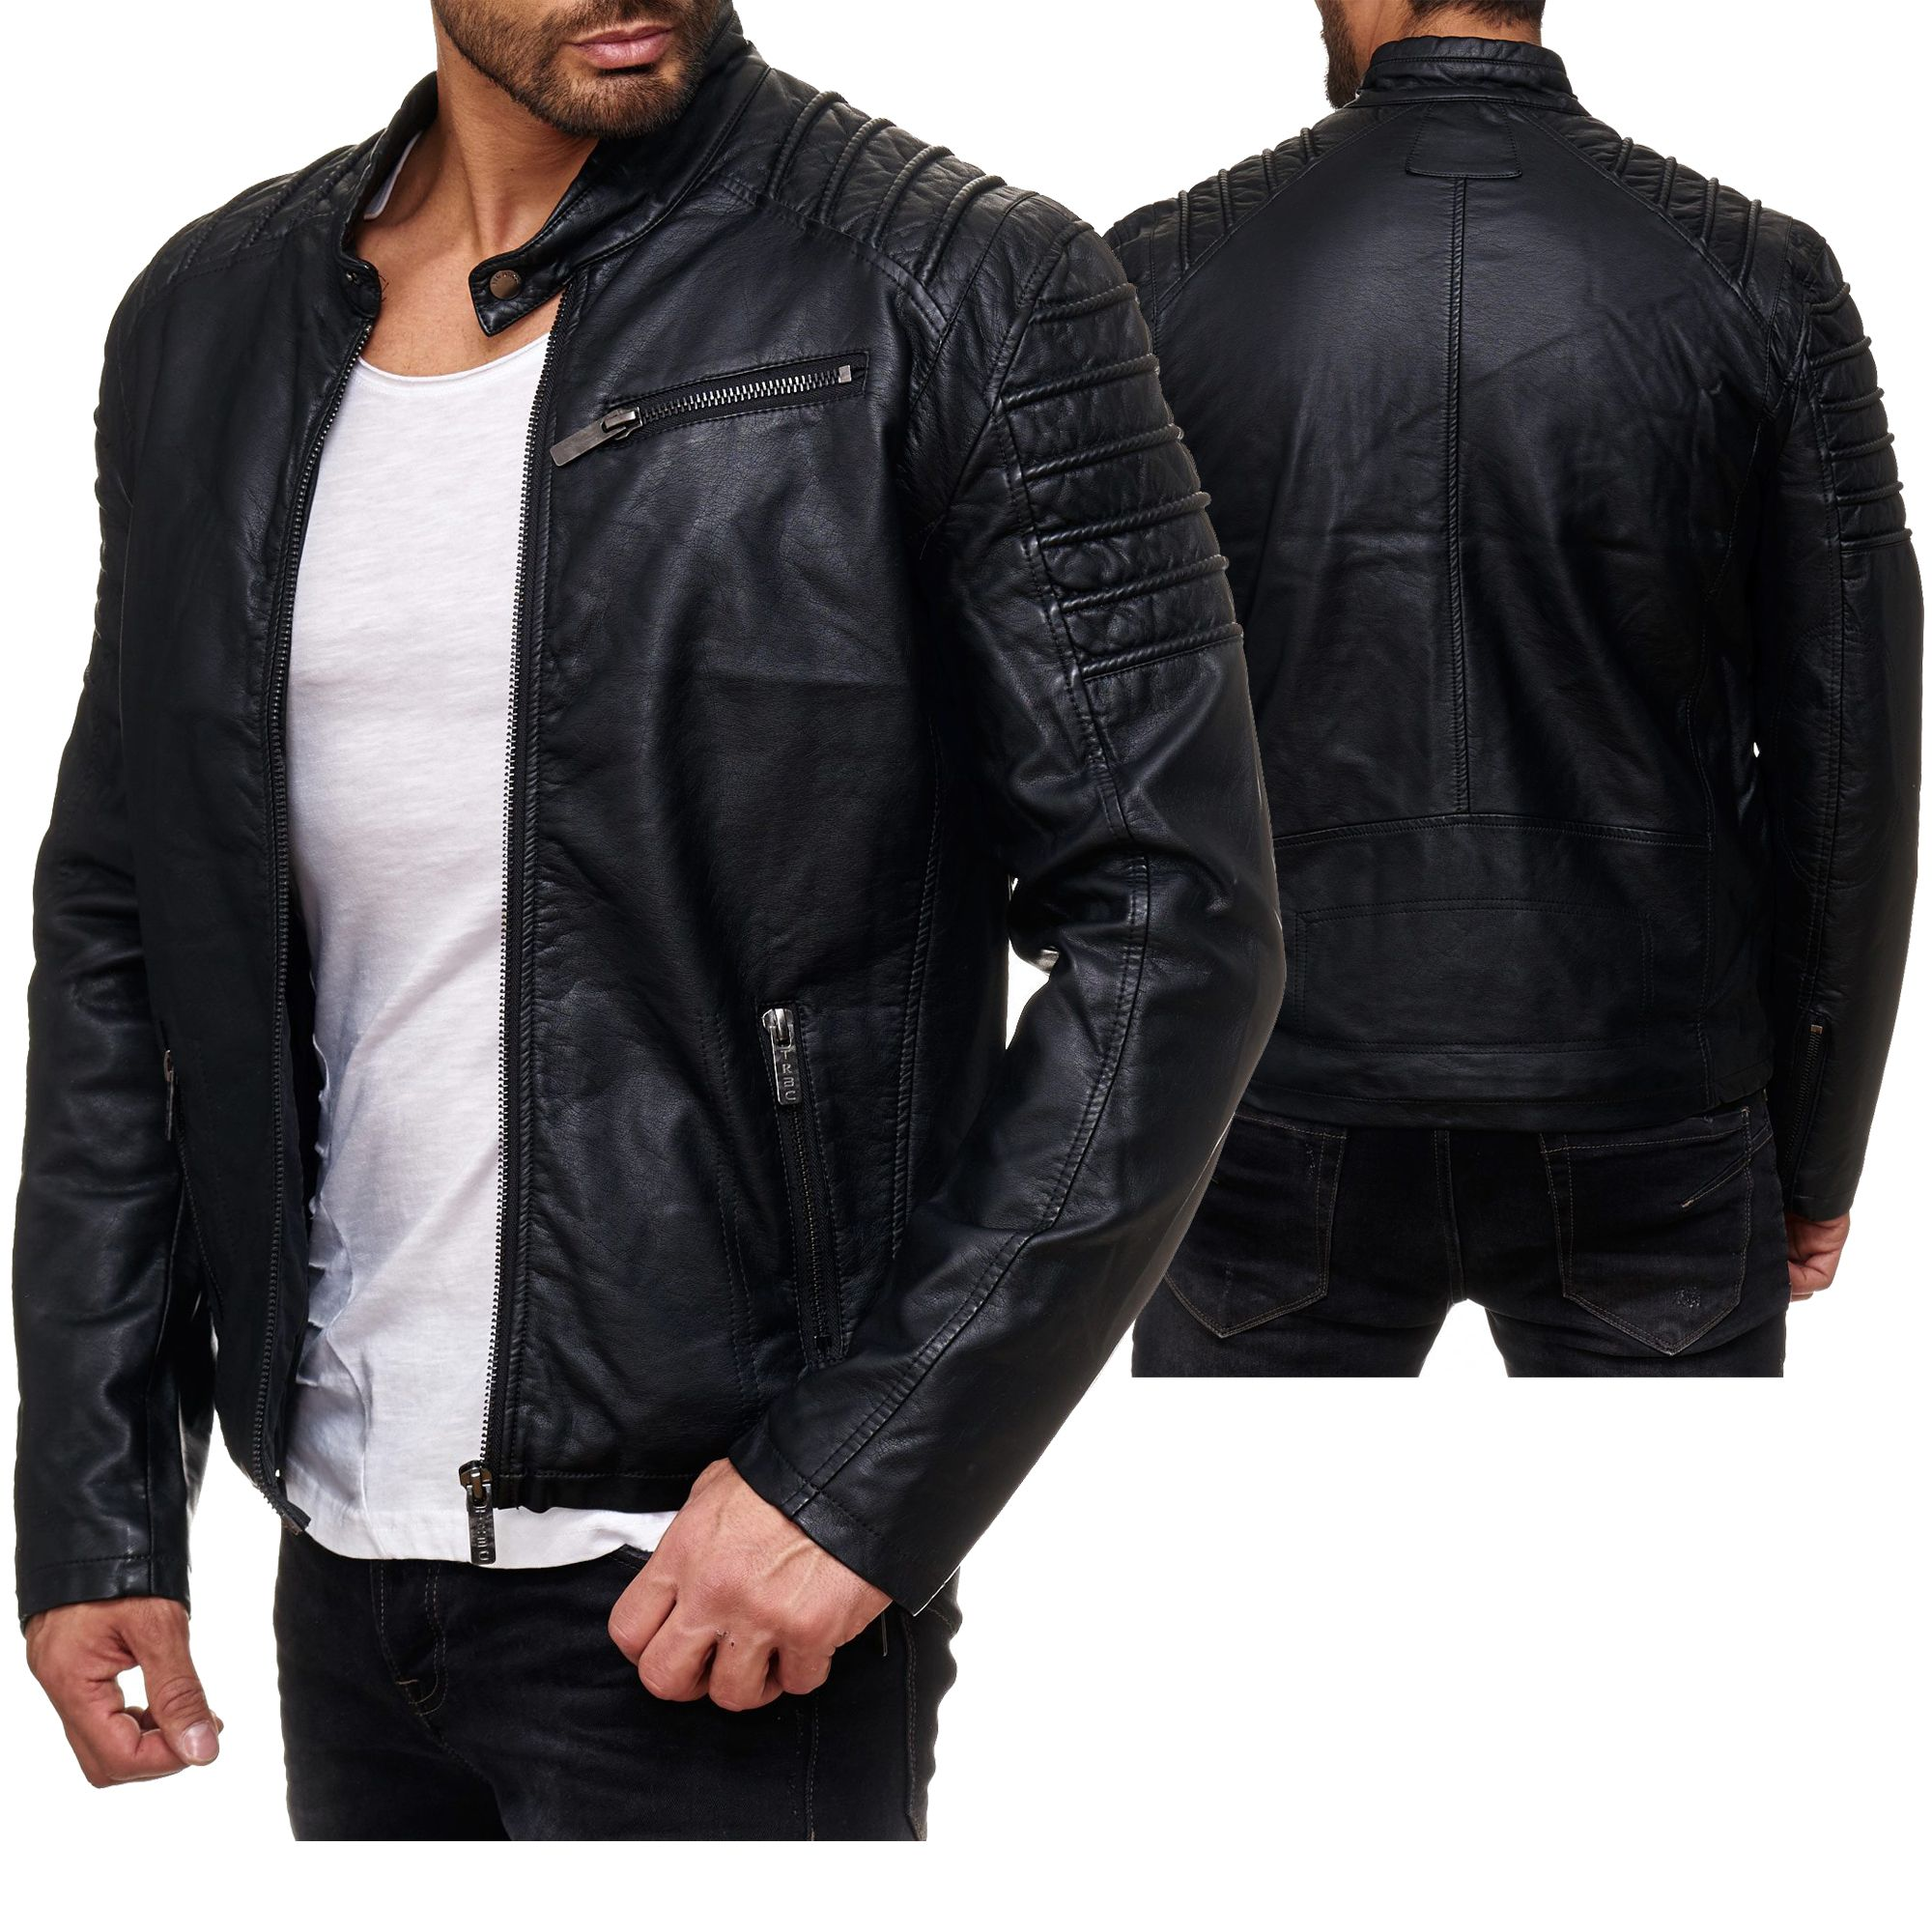 Designer Herren Motorrad Lederjacke Bikerjacke Vintage Jacke Motorradjacke Used